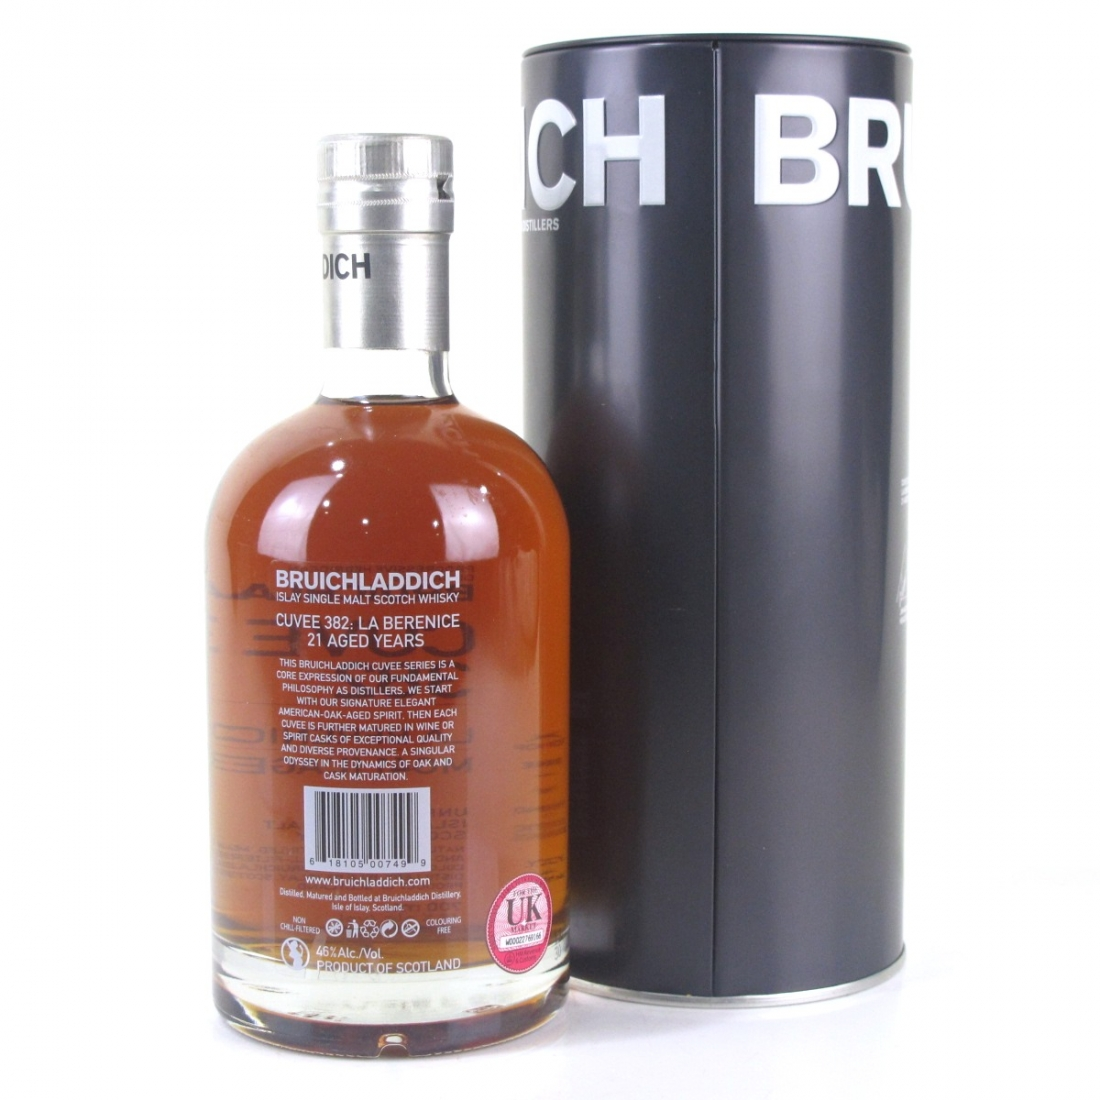 Bruichladdich 21 Year Old Cuvee #382 Sweet Wine Finish